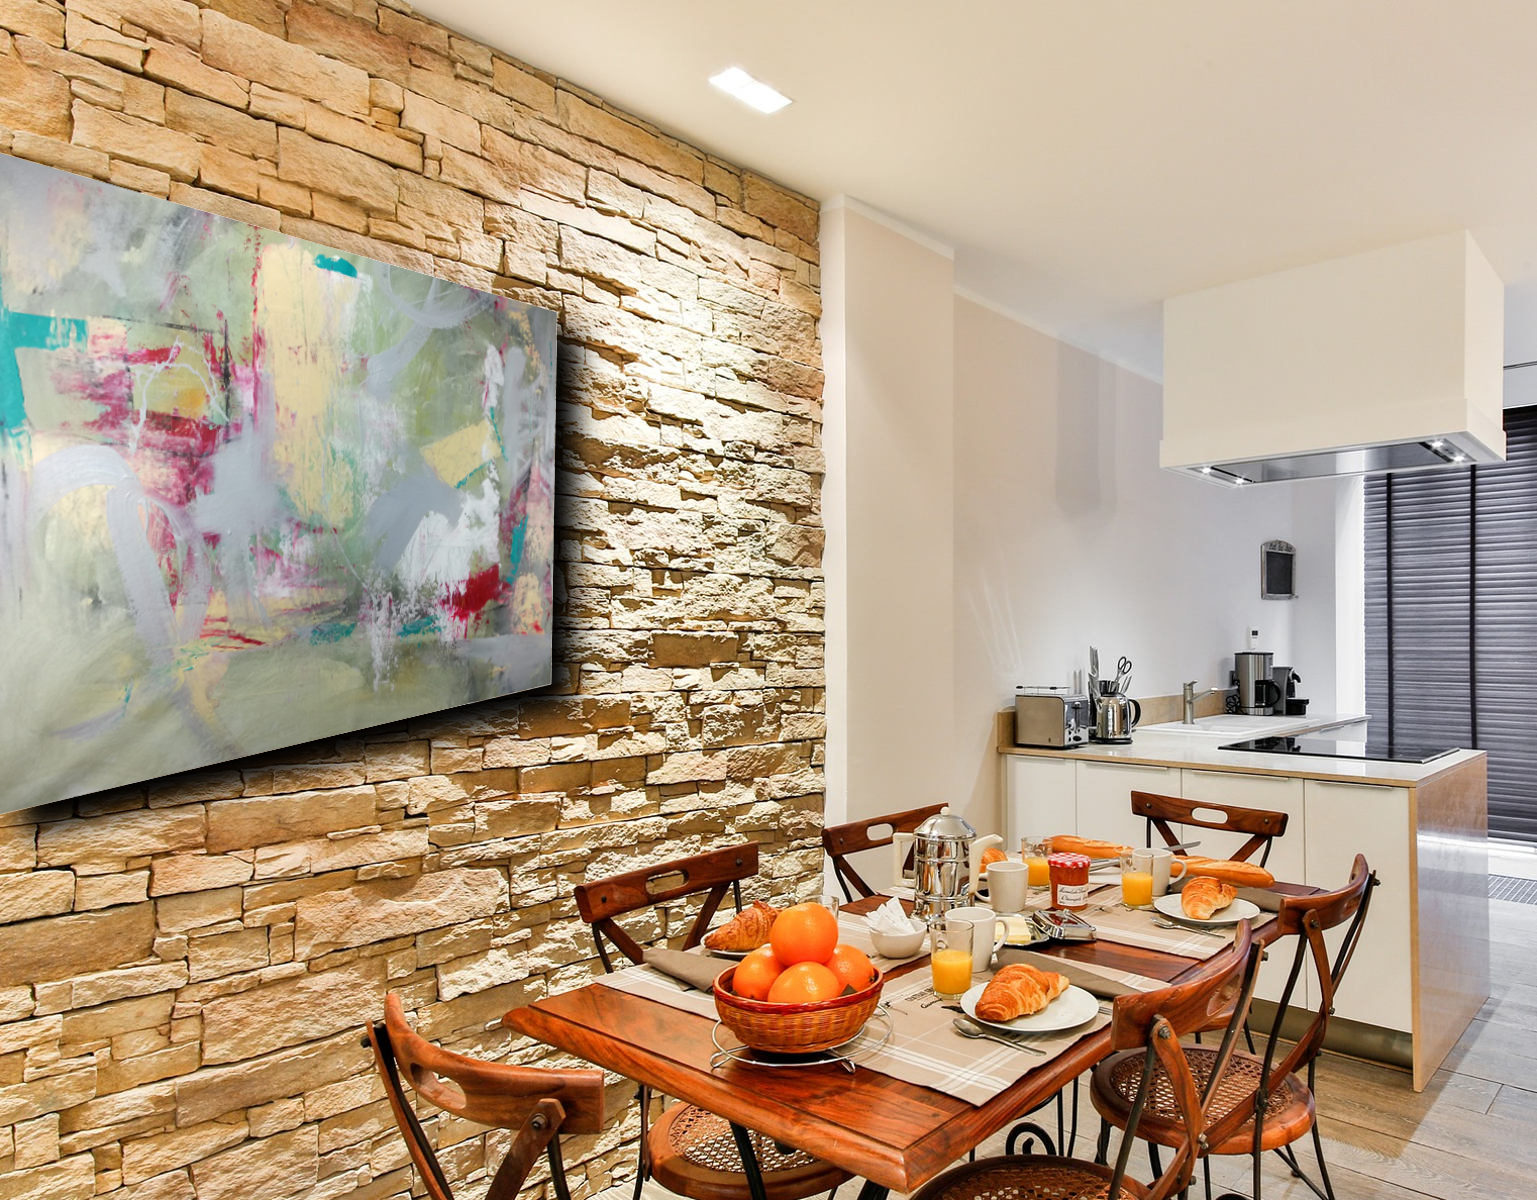 Quadri per cucina moderna amazing quadro per la cucina moderna e rustica with quadri per cucina - Quadri per casa moderna ...